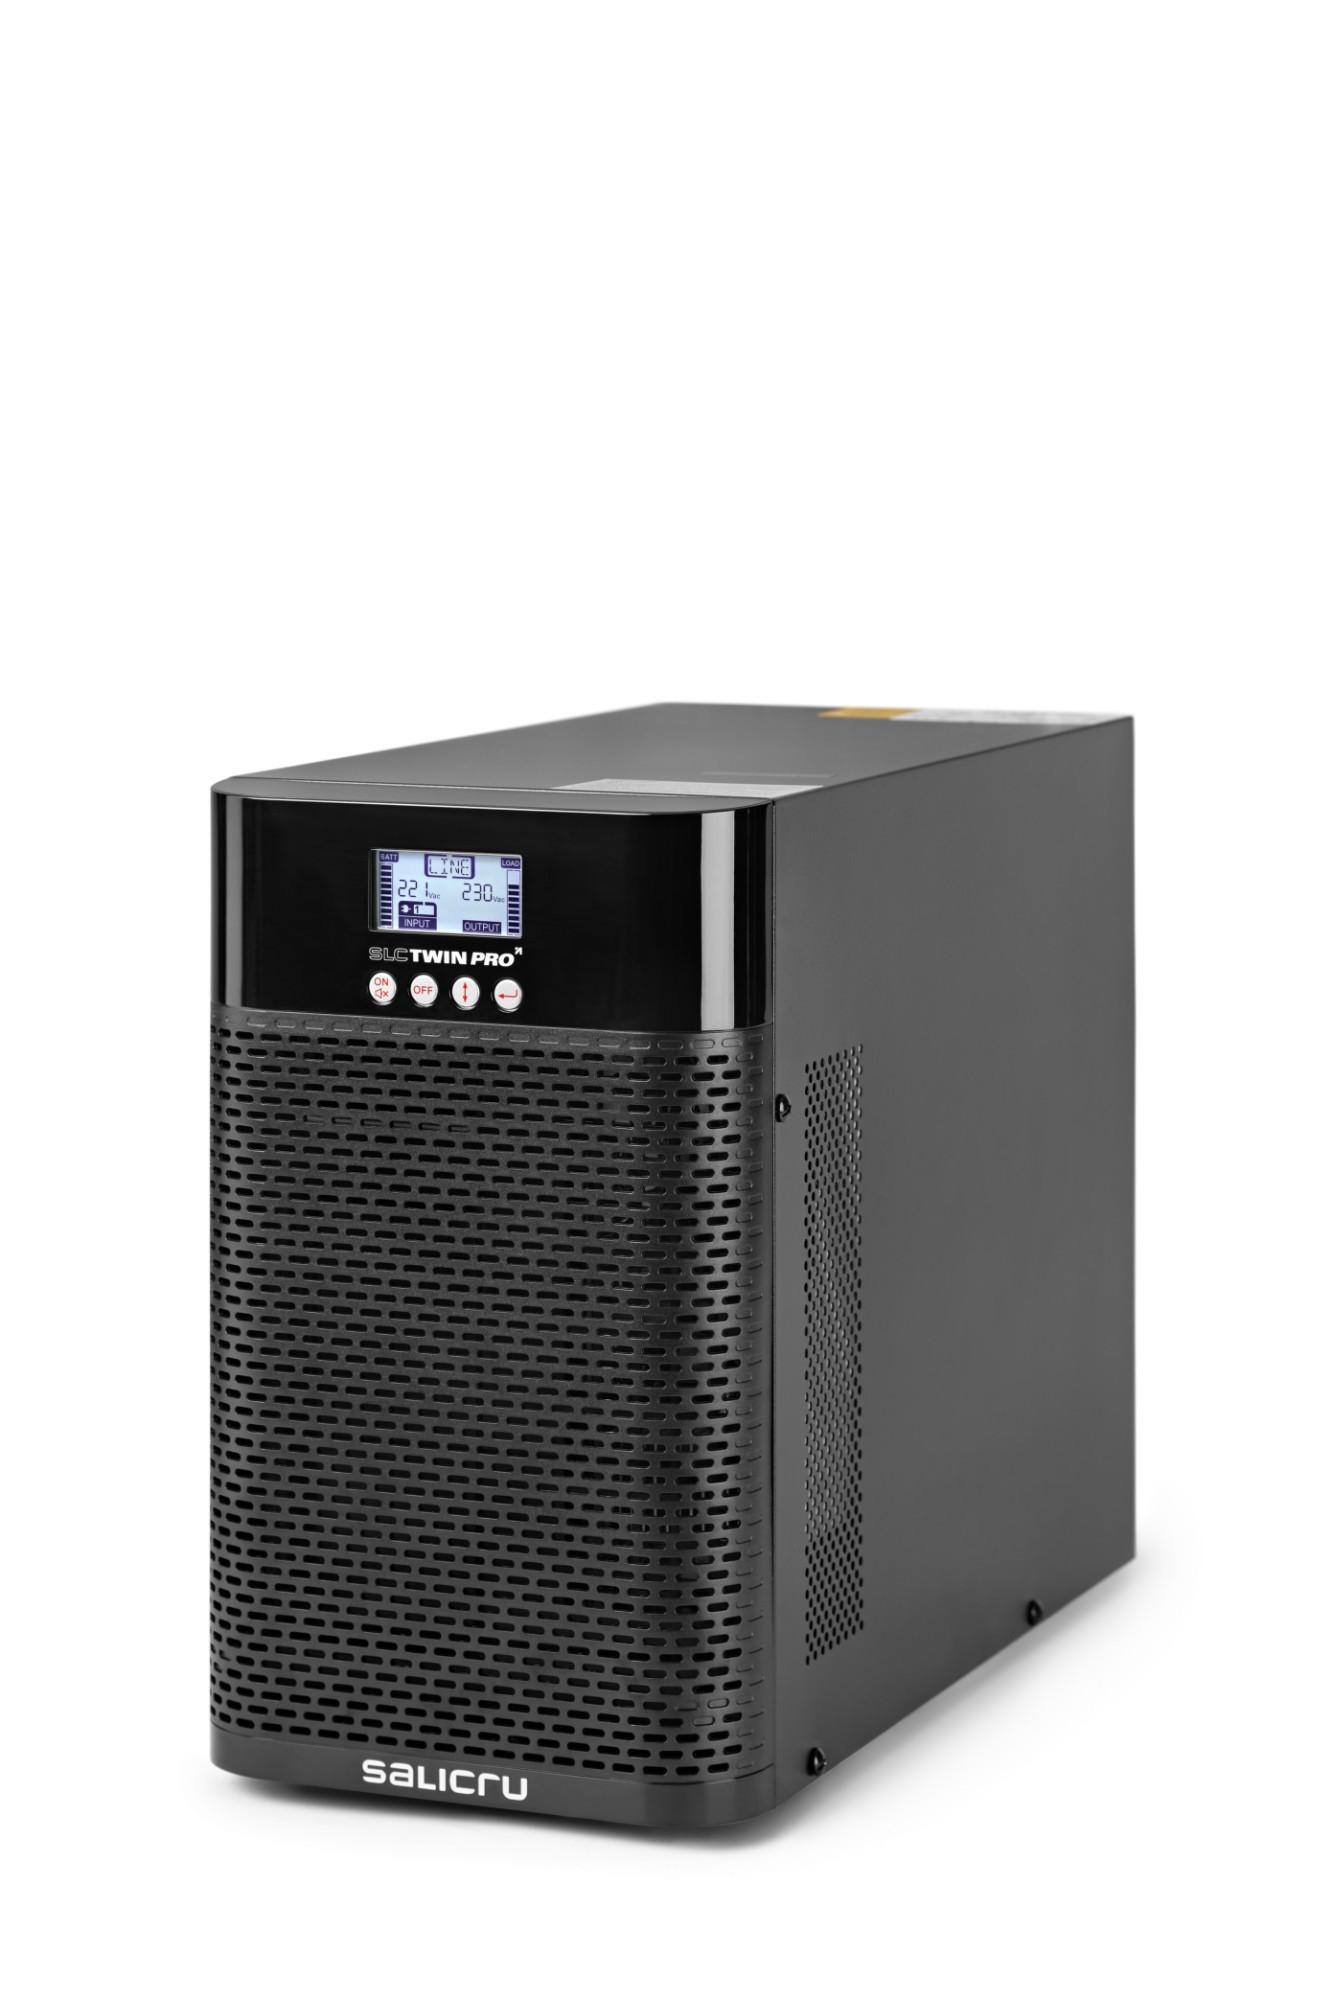 Salicru SLC 1500 TWIN PRO2 SAI On-line doble conversión de 700 VA a 3000 VA